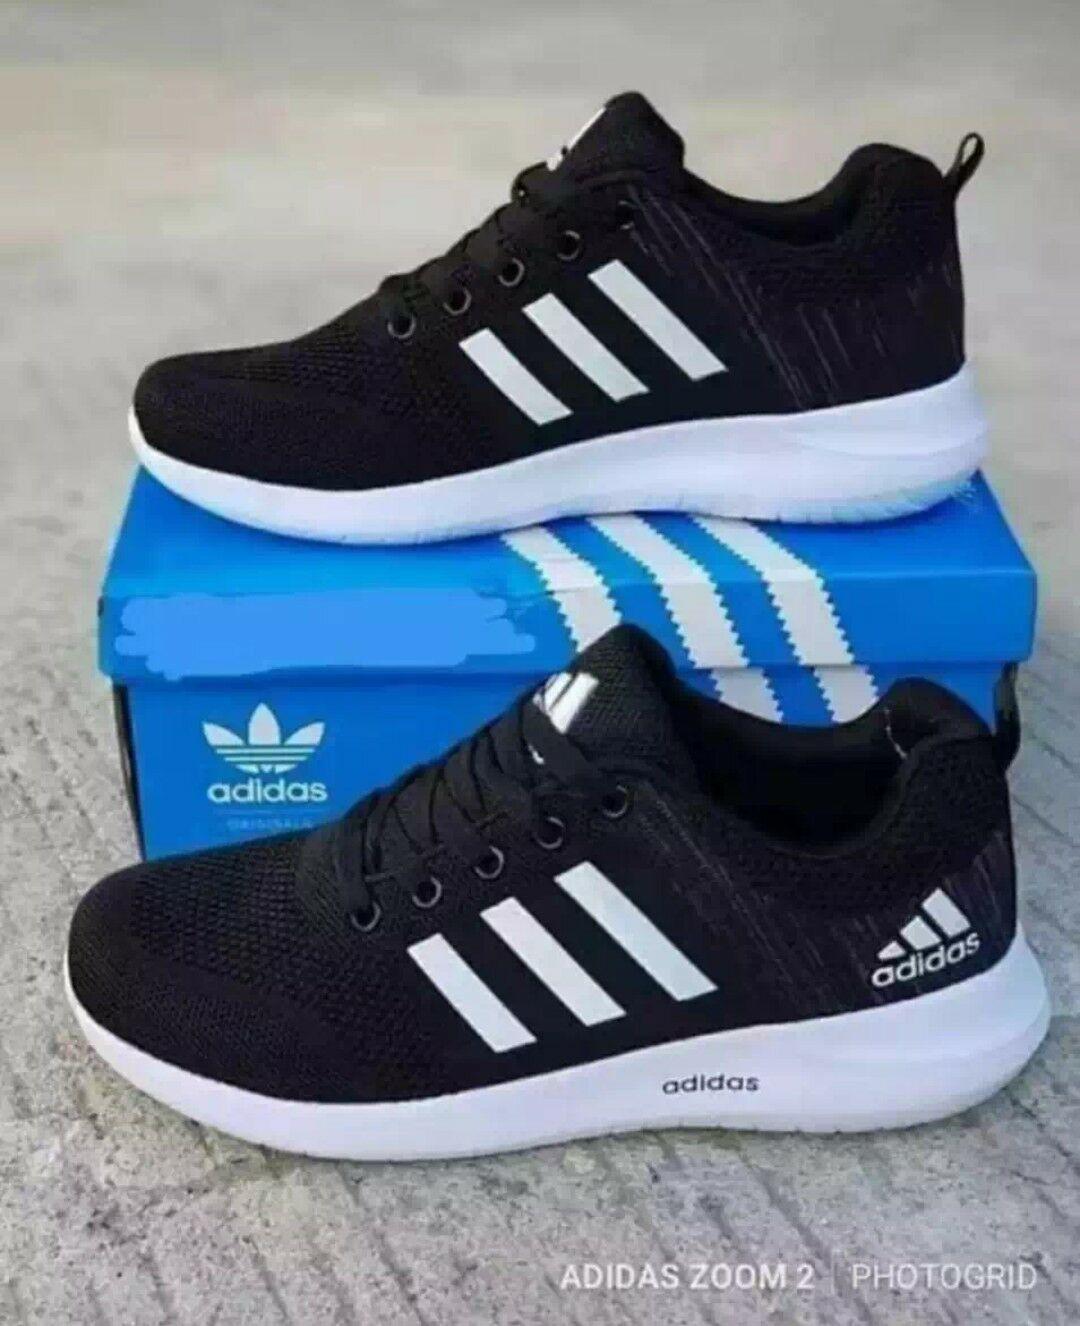 Adidas Sports Zoom Running Low Cut